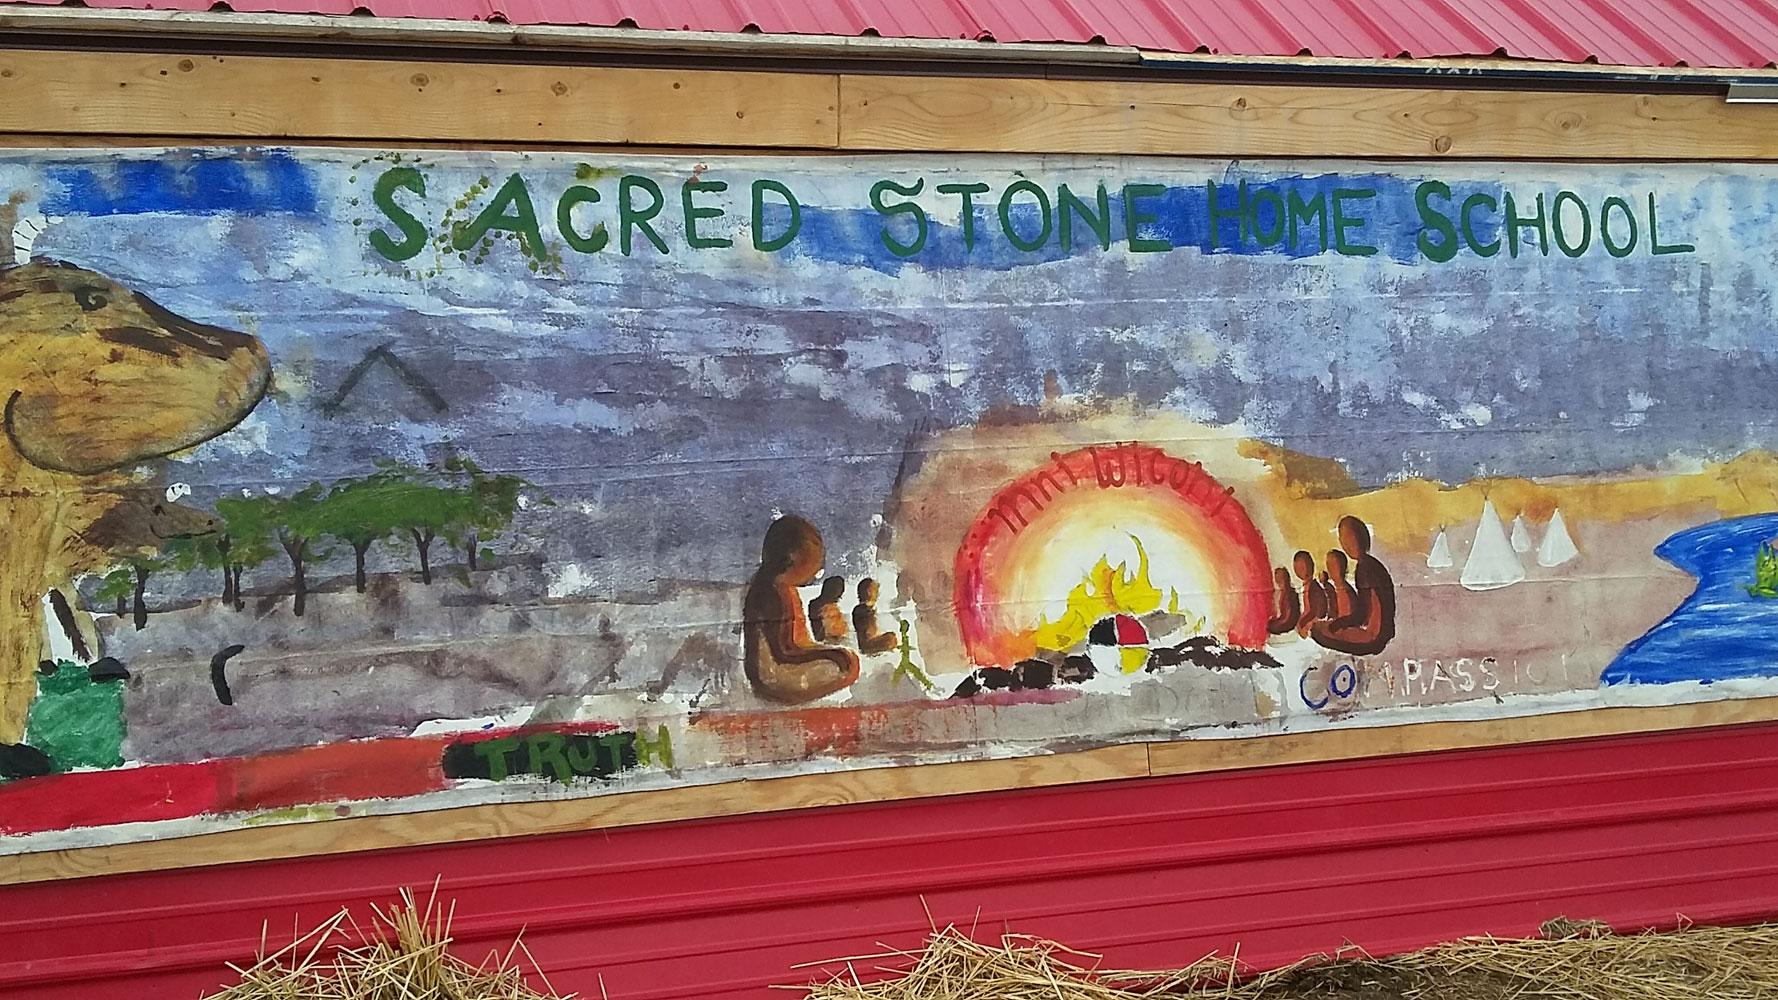 Sacred Stone camp school